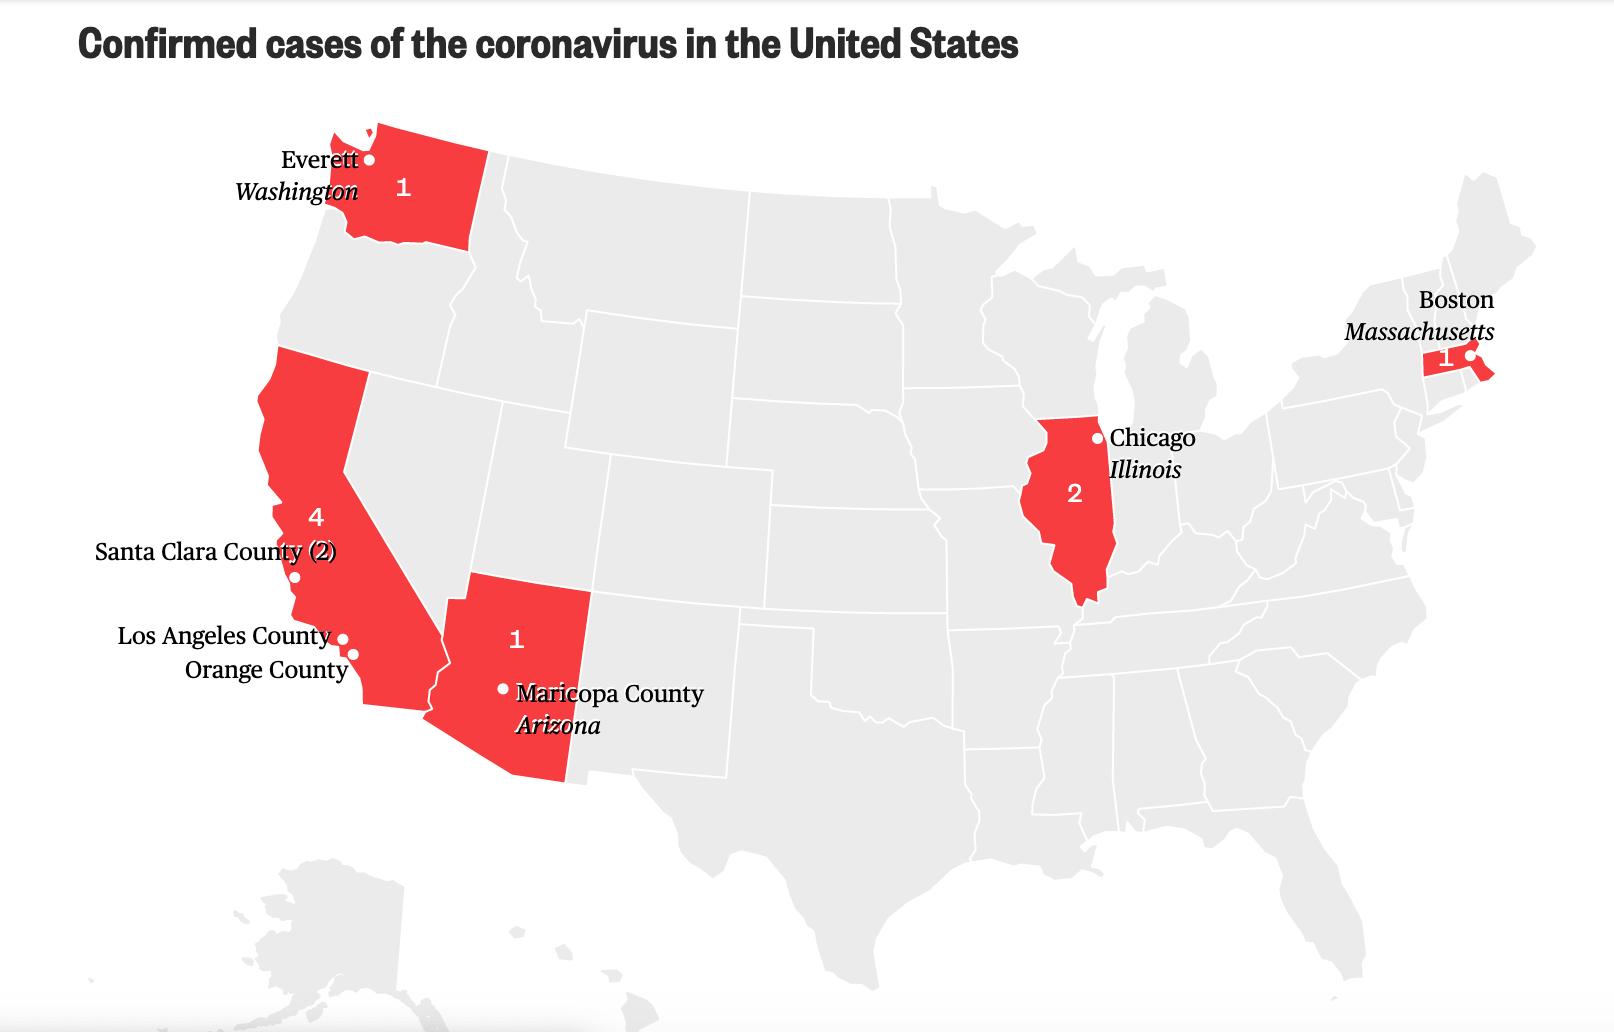 Confirmed cases of Coronavirus